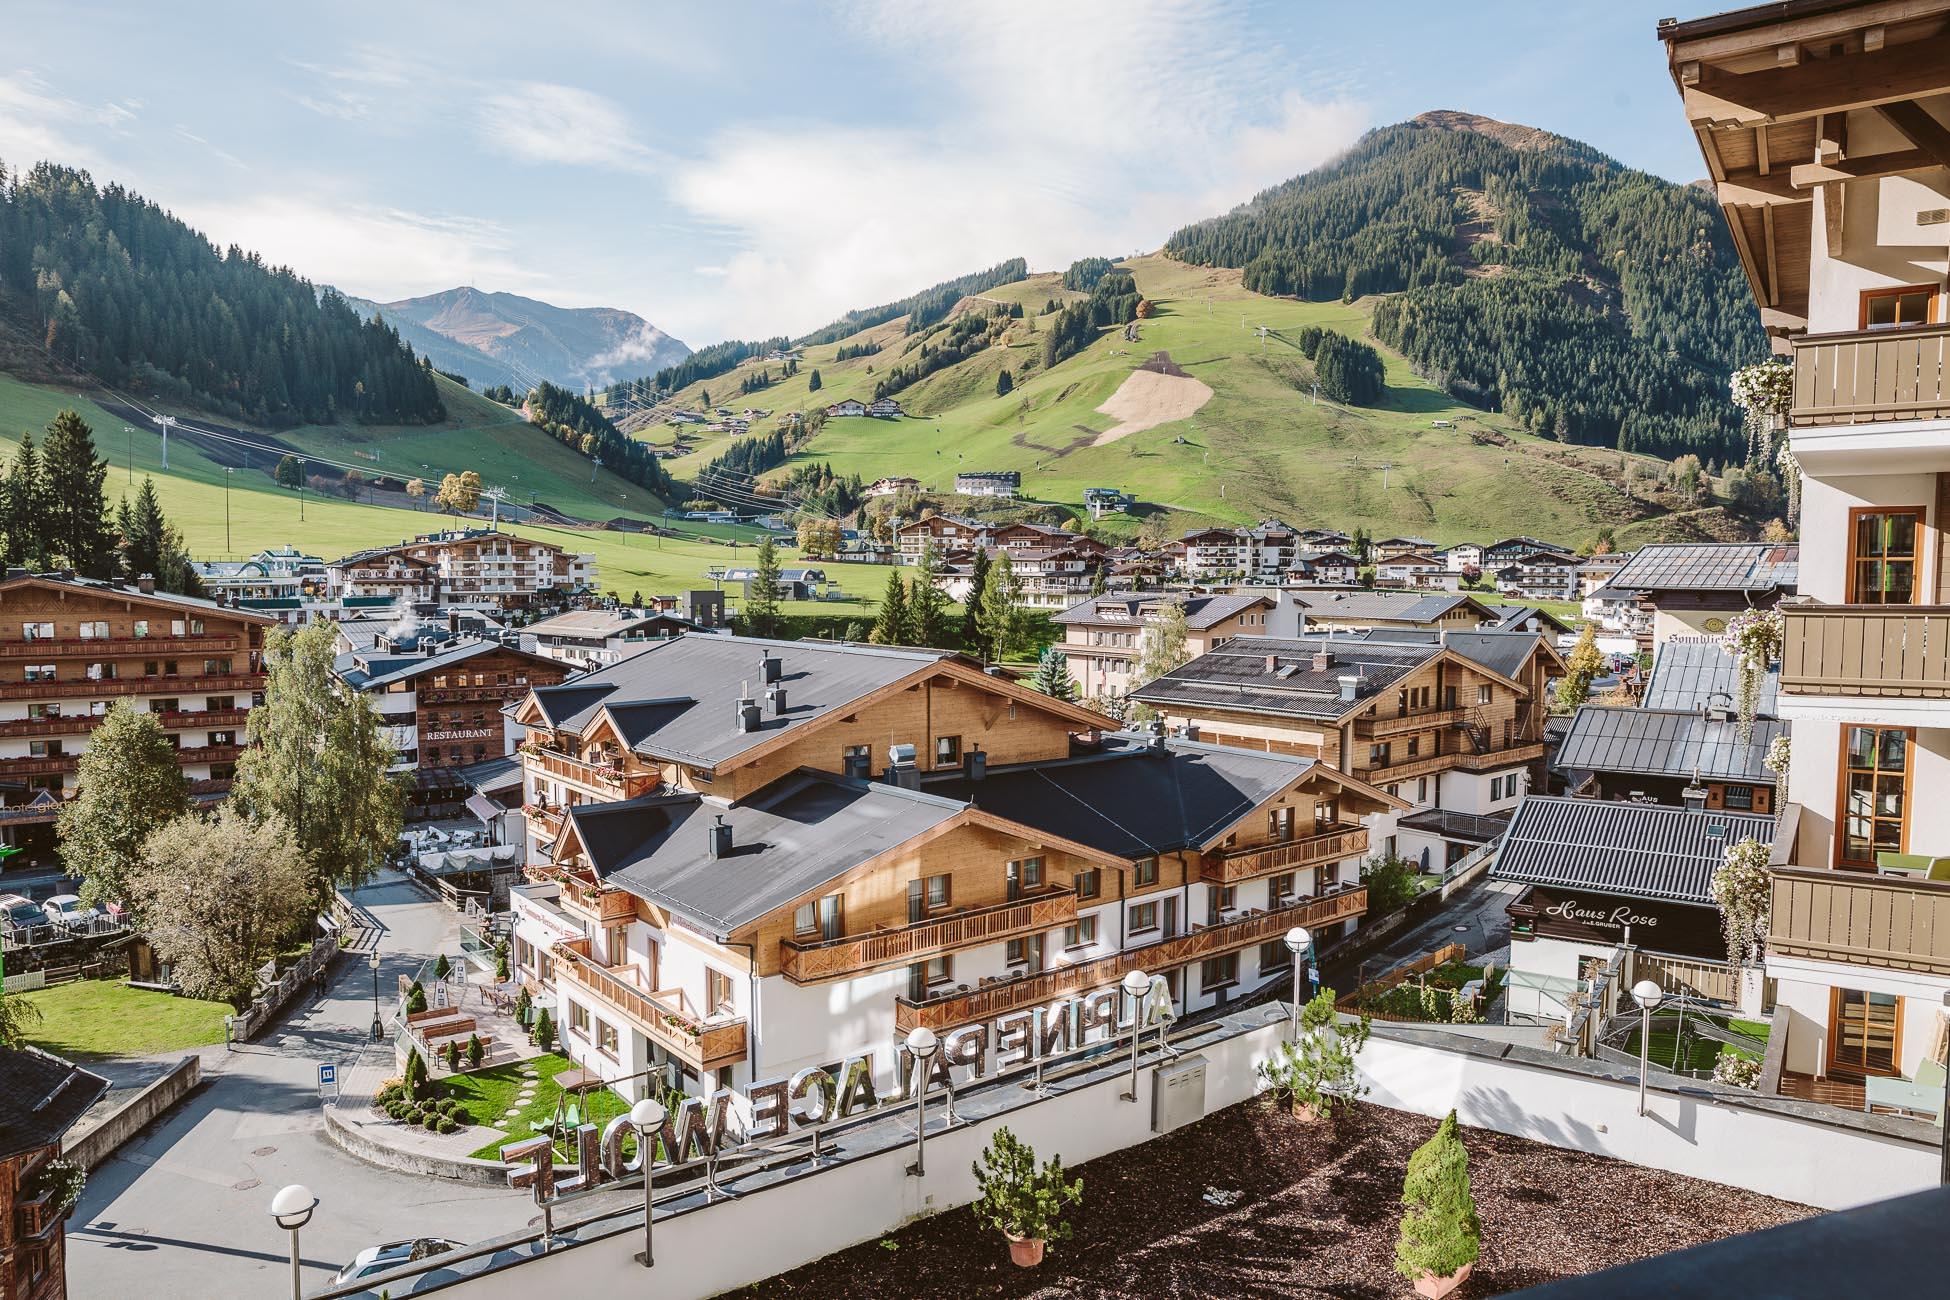 Alpine Palace Saalbach Hinterglemm